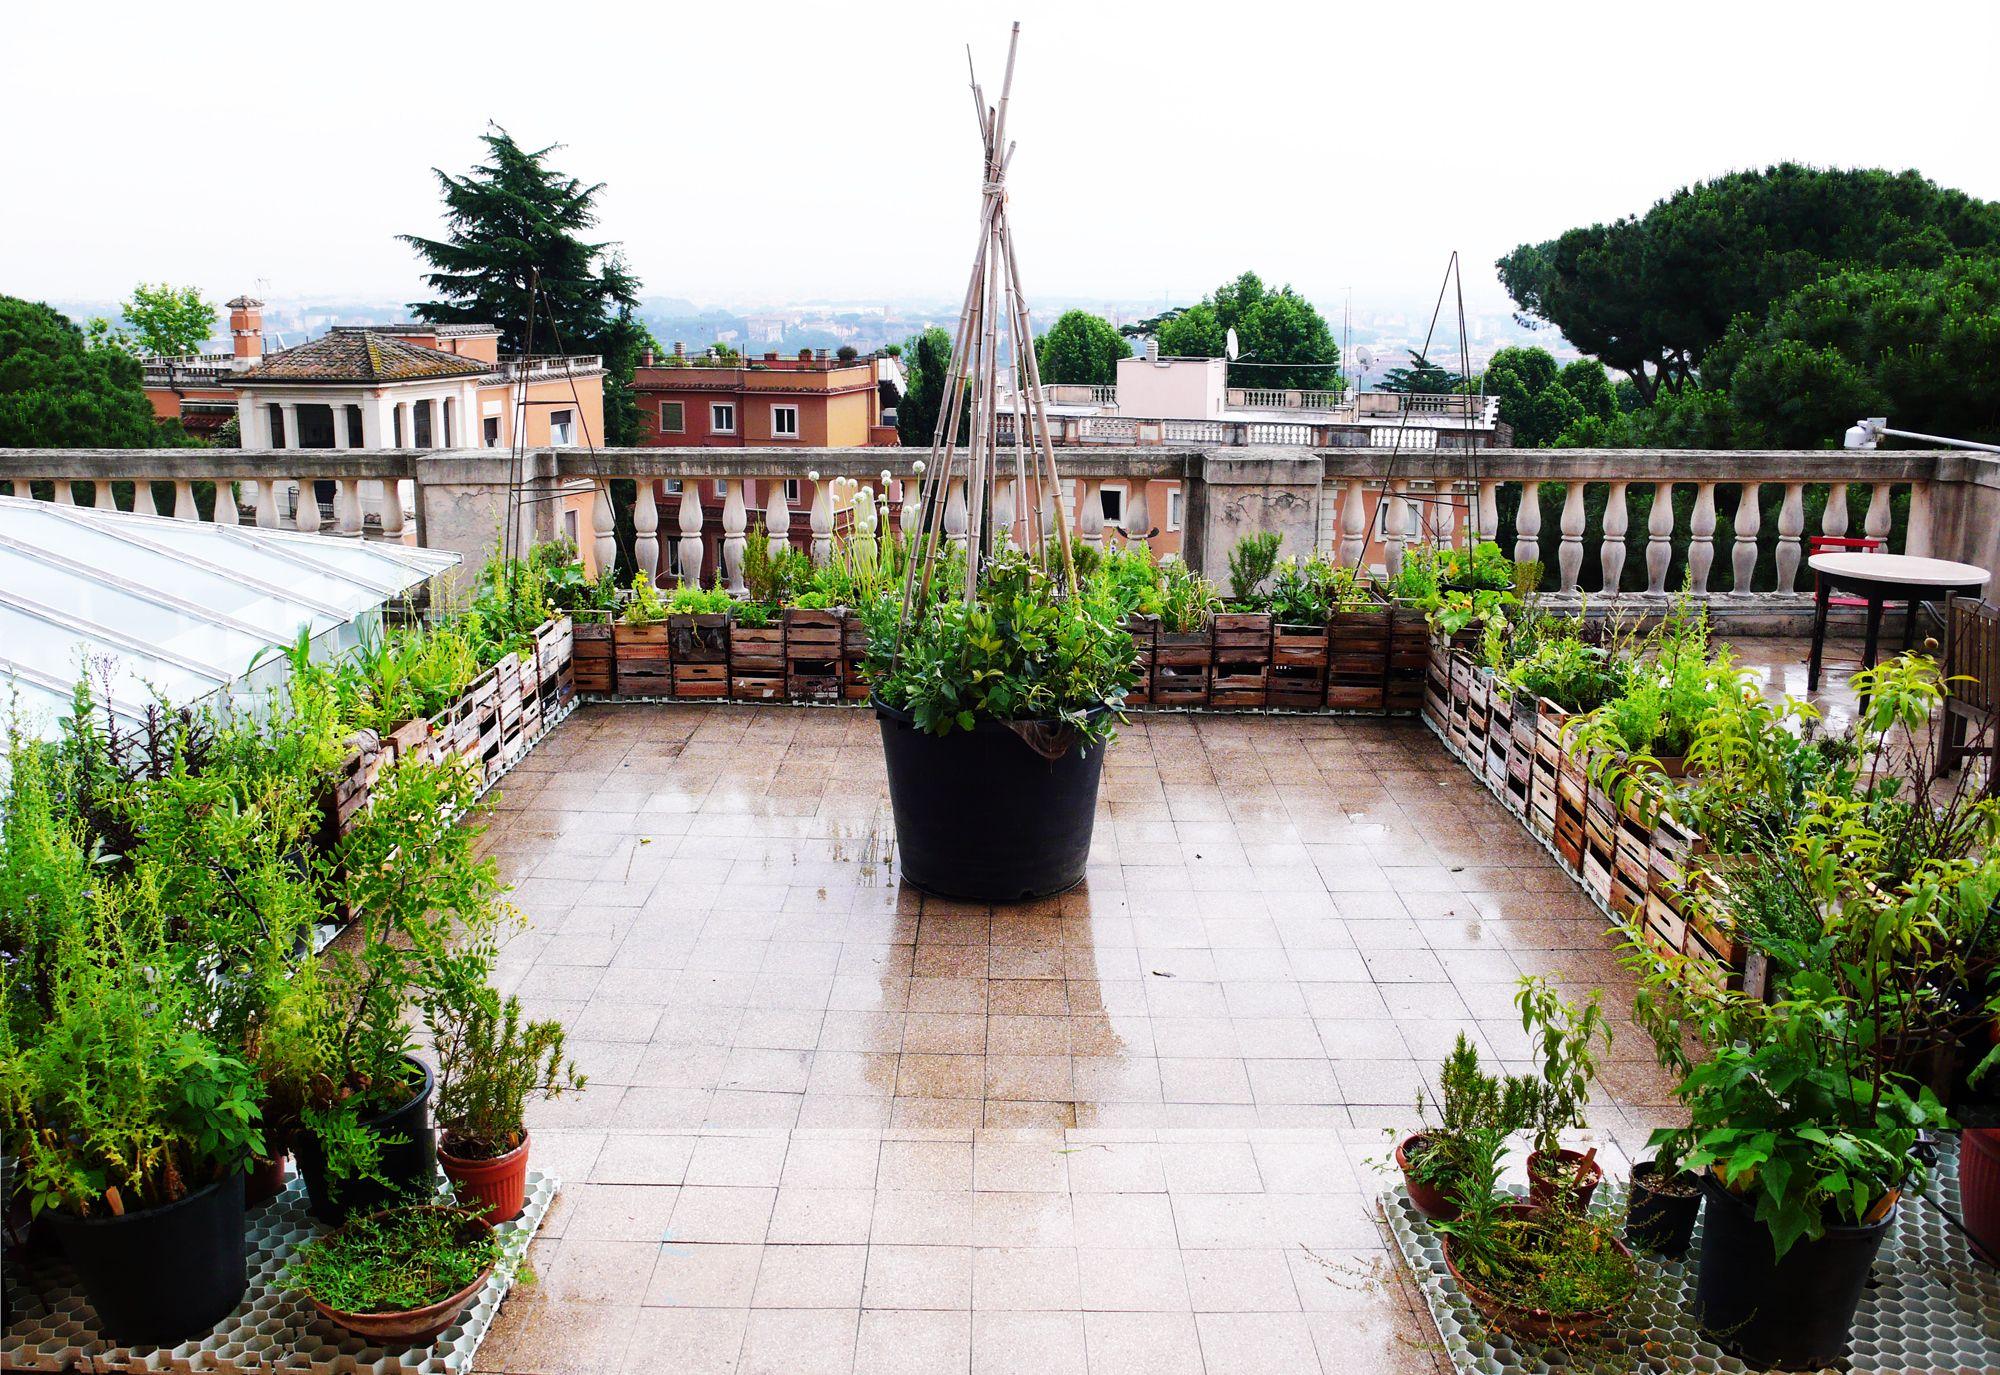 Roof Garden Tiles Google Search Rooftop Garden Roof Garden Garden Tiles